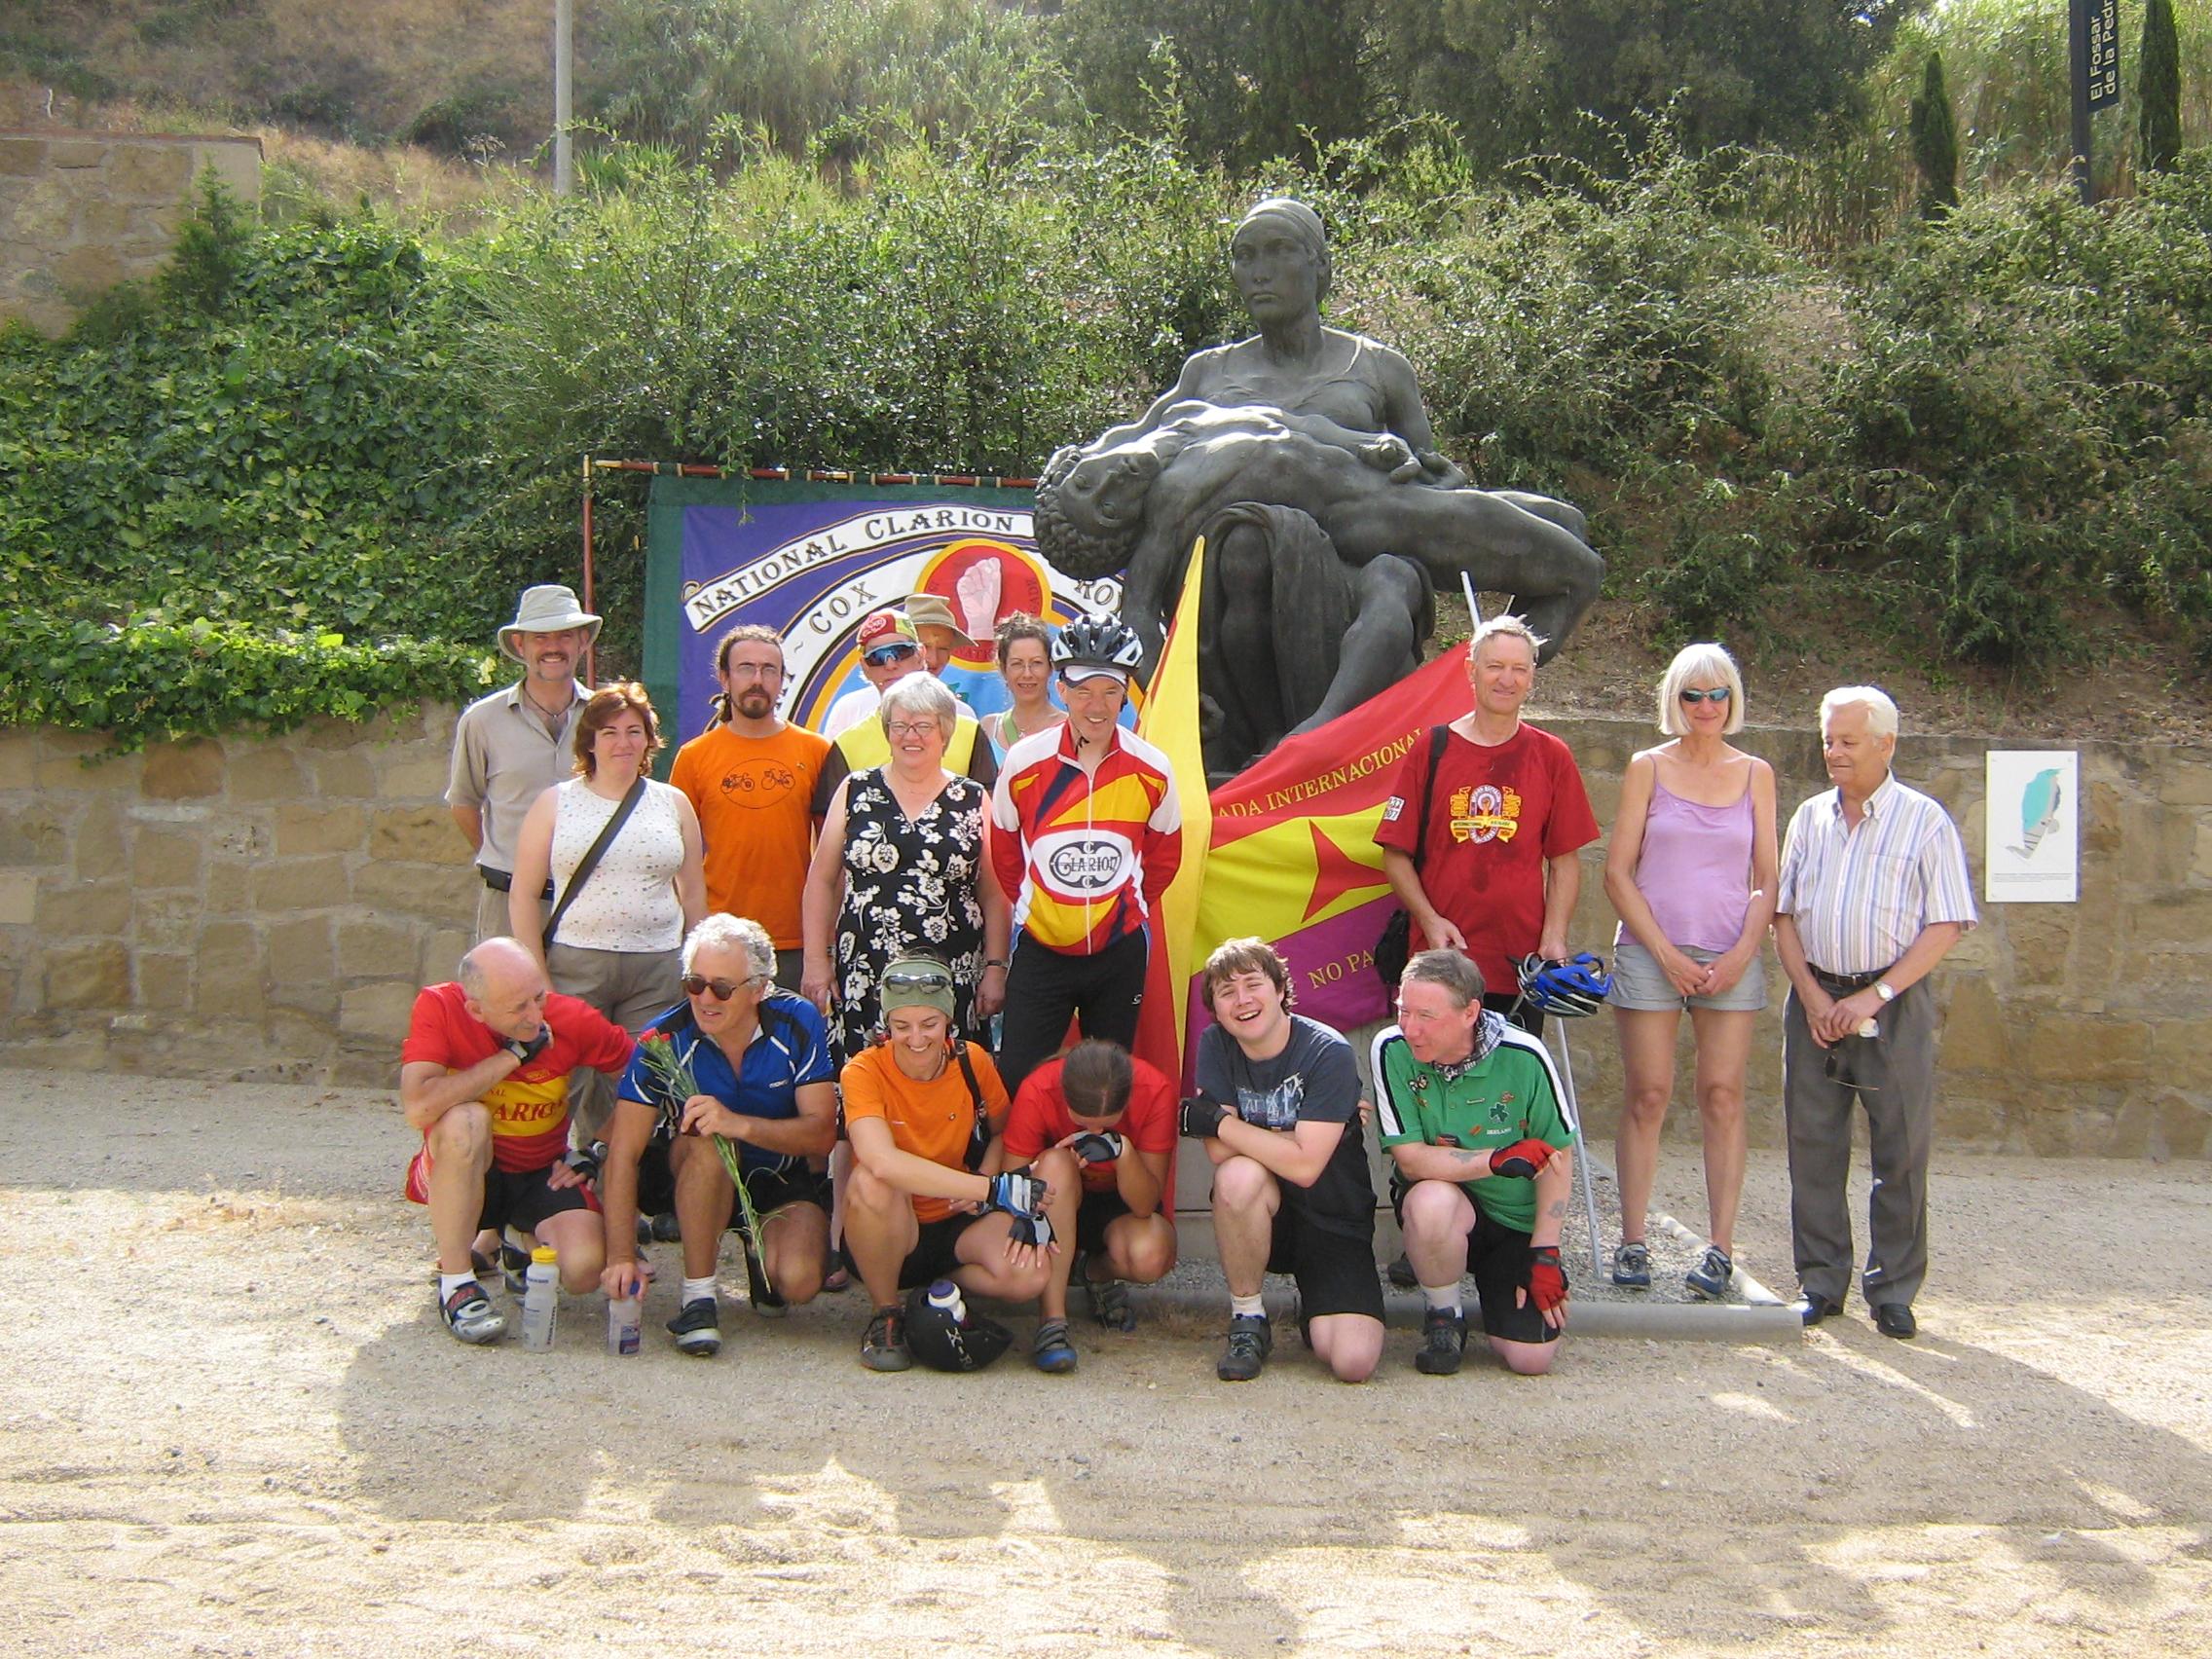 The cyclists at La Fosse de Pedrera, Montjuic